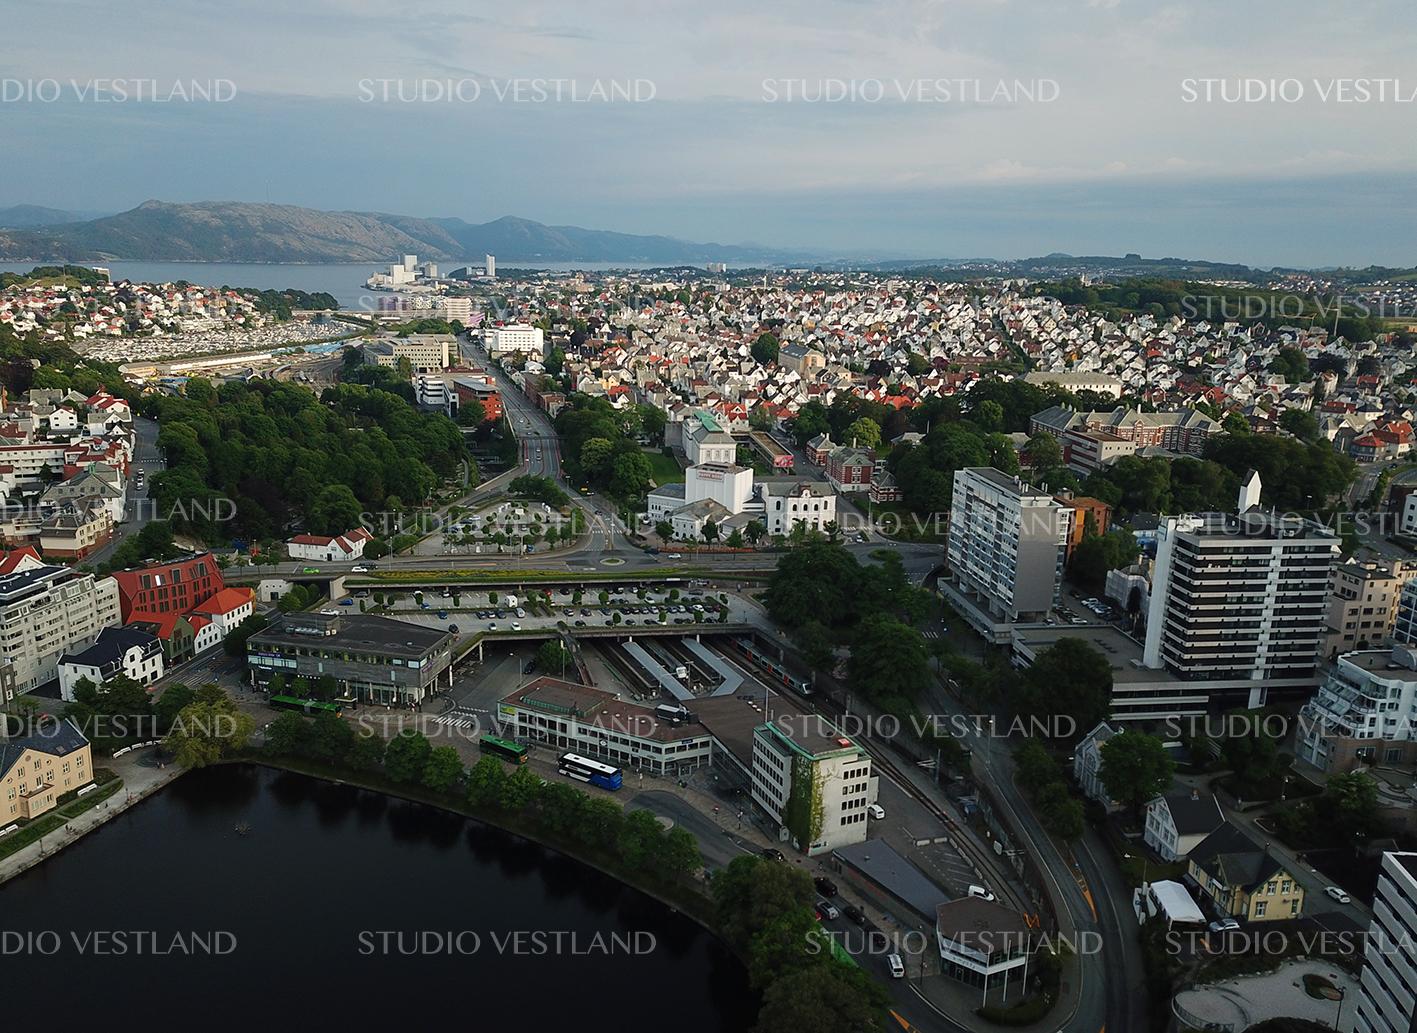 Studio Vestland - Stavanger 17